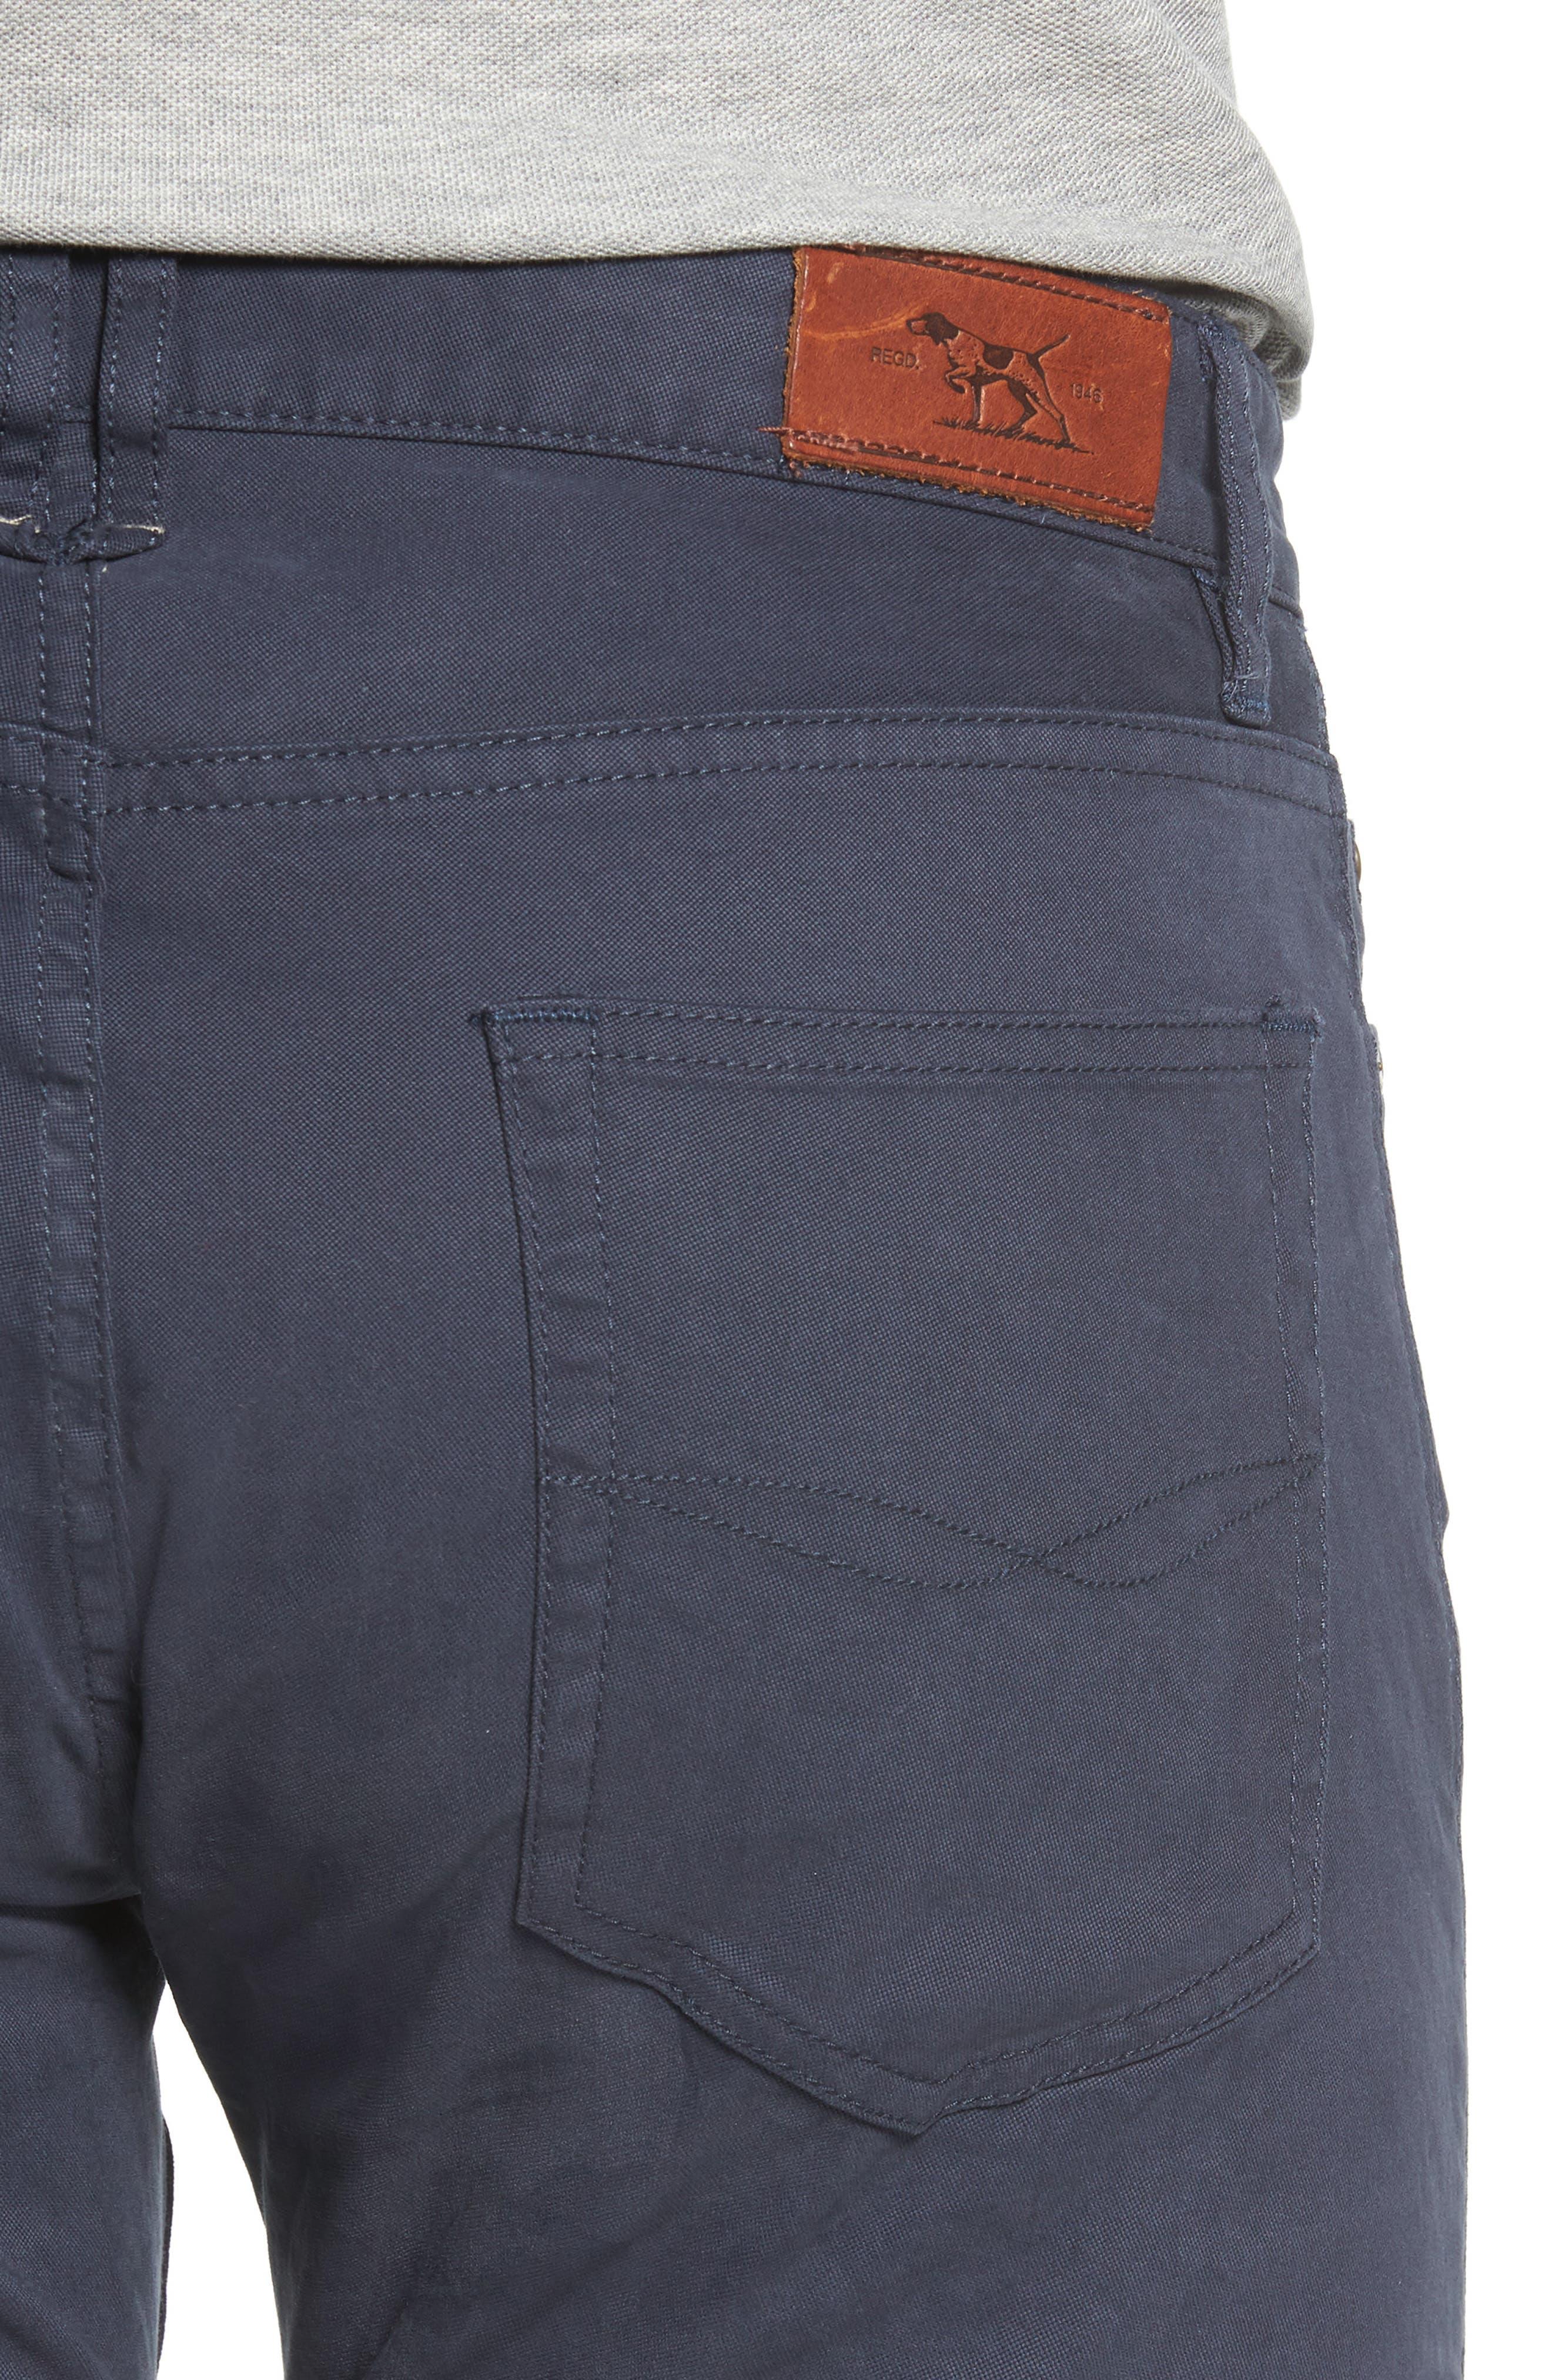 Fencourt Regular Fit Straight Leg Jeans,                             Alternate thumbnail 4, color,                             MIDNIGHT